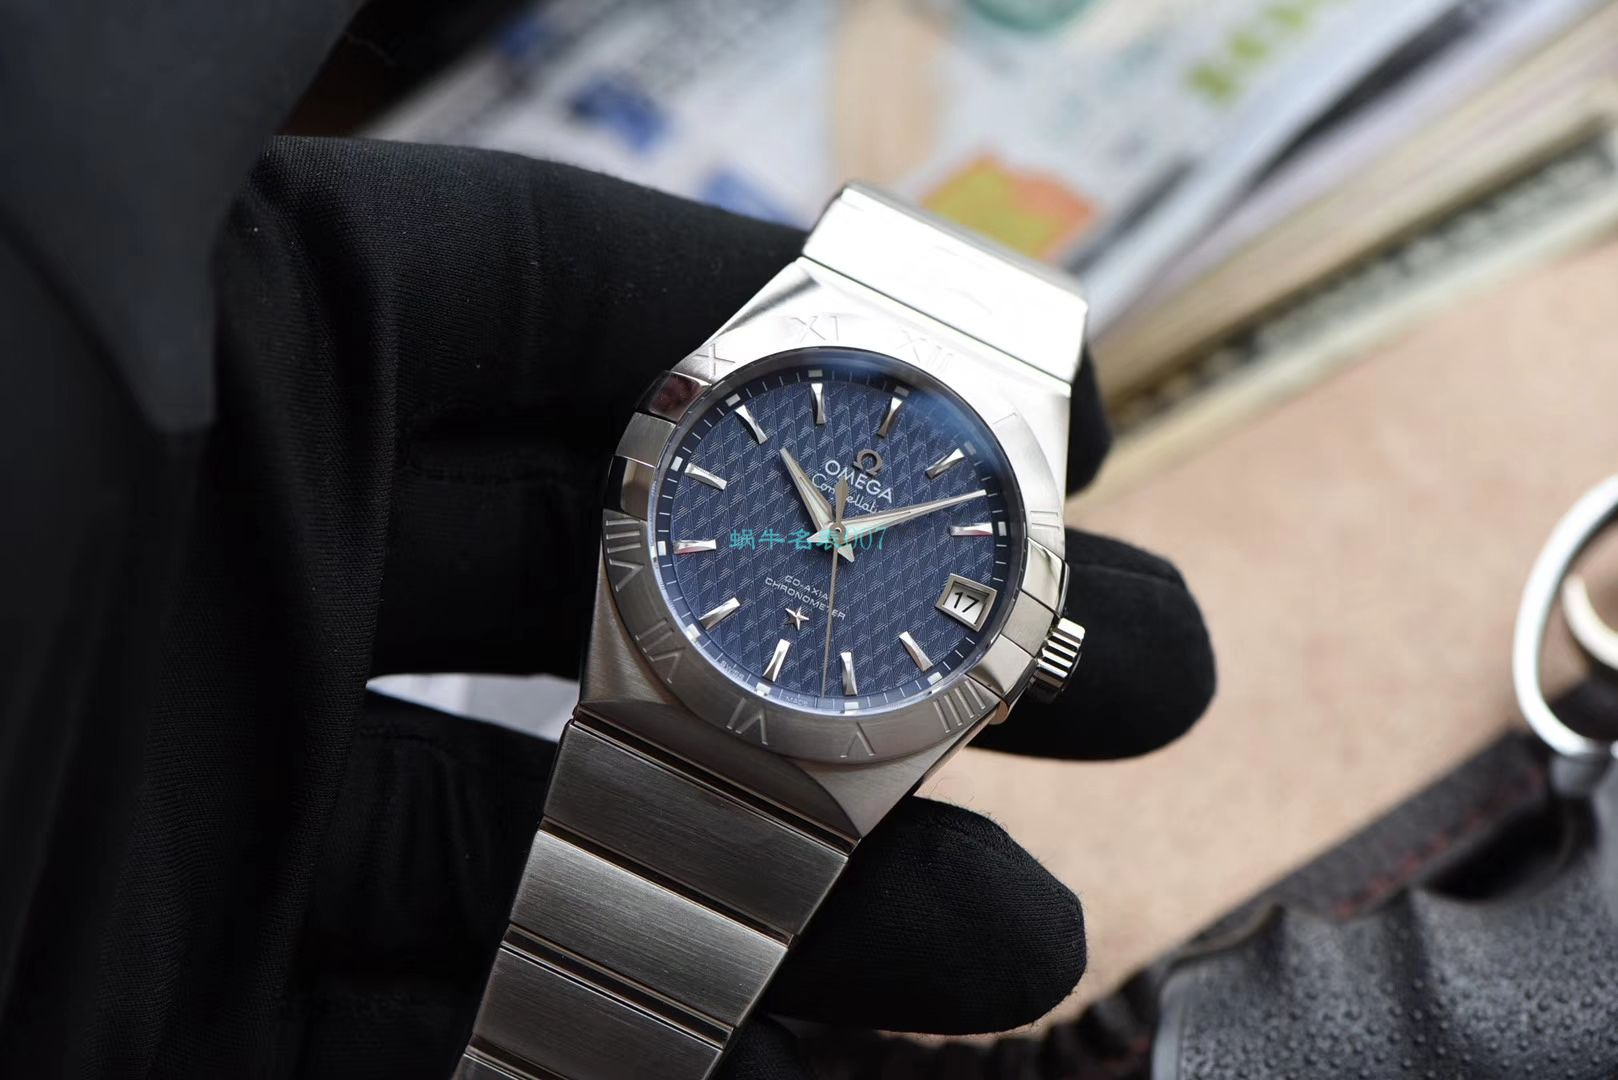 VS厂官网欧米茄星座系列123.10.38.21.03.001腕表 / M688